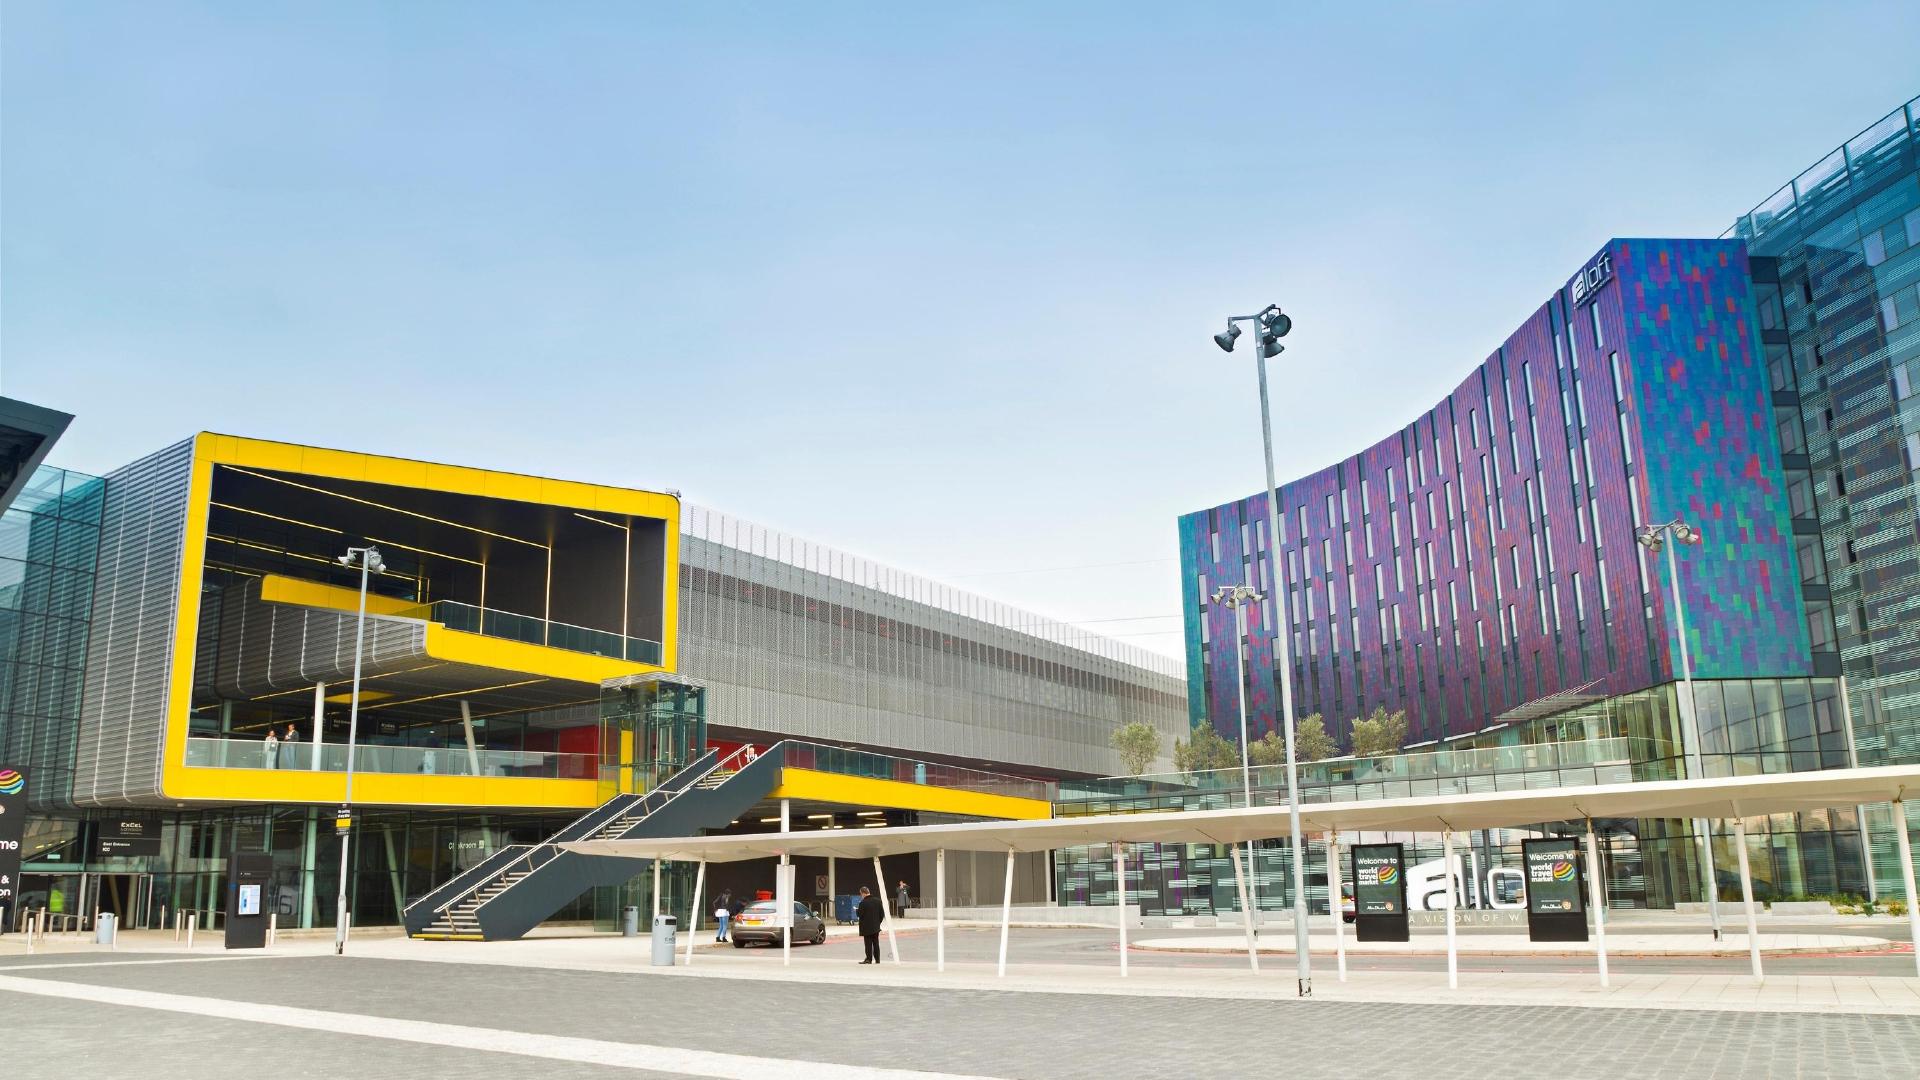 Colourful ExCel centre buildings.